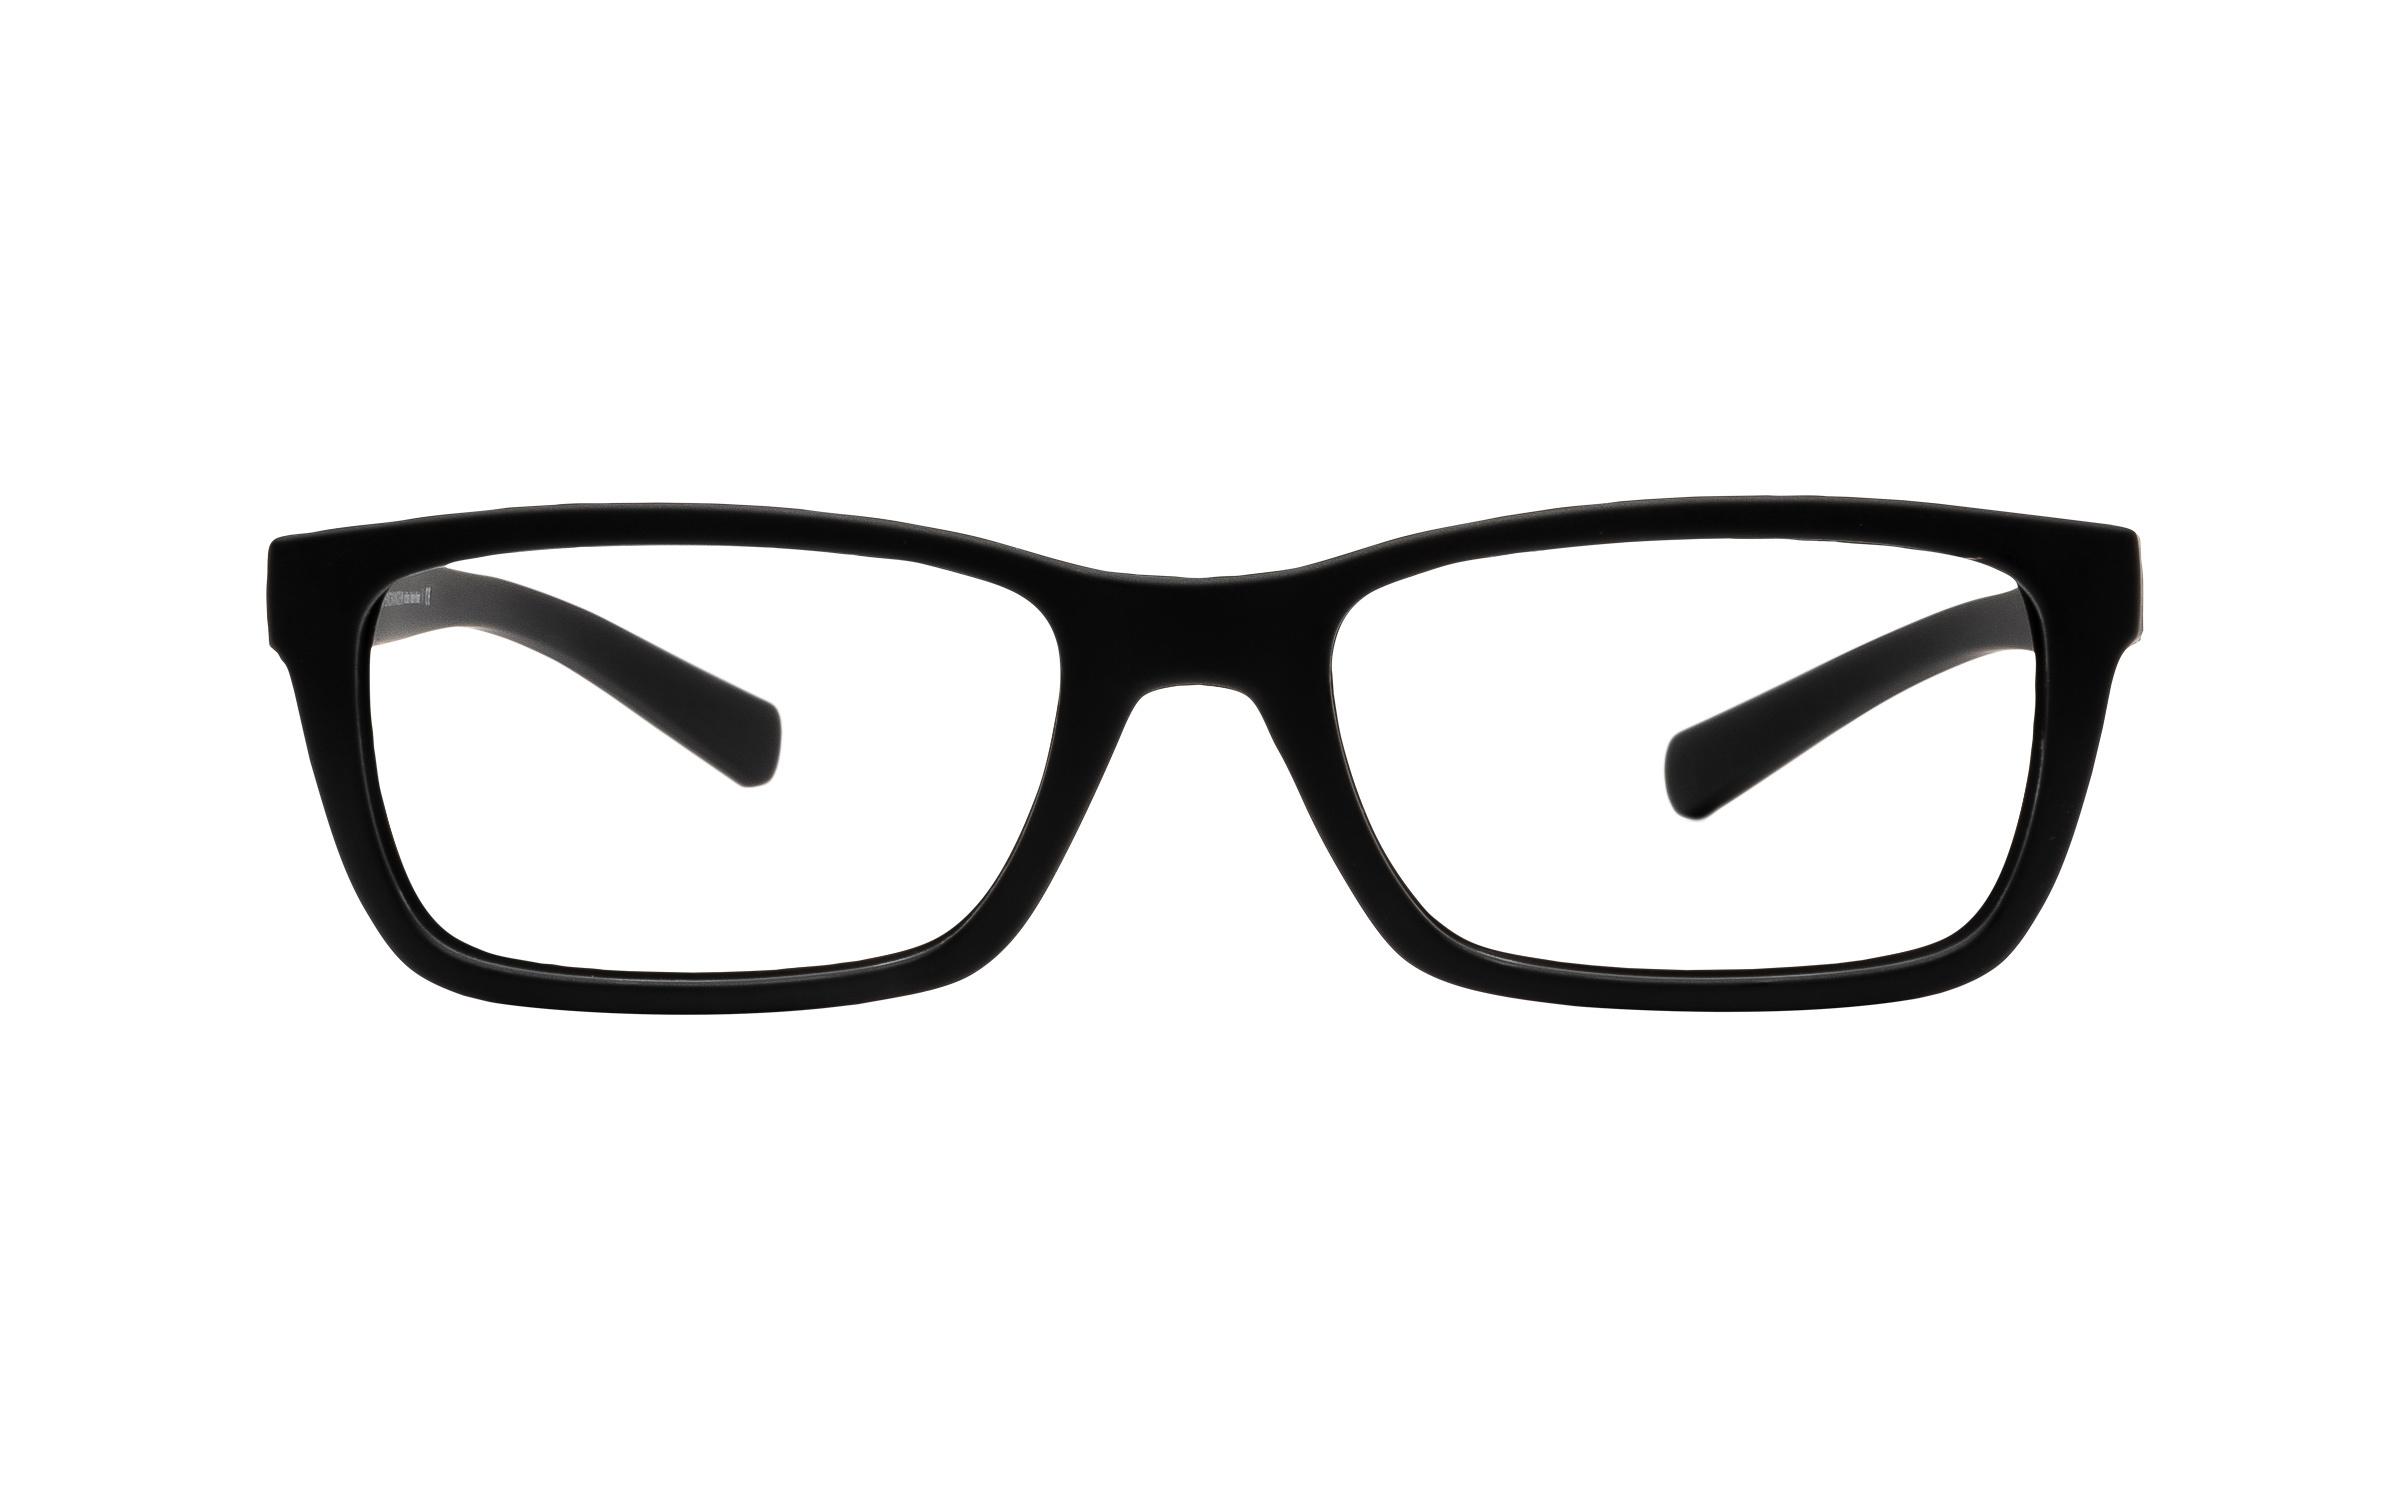 Luxottica Armani Exchange AX3007 8325 (53) Eyeglasses and Frame in Matte Black - Online Coastal